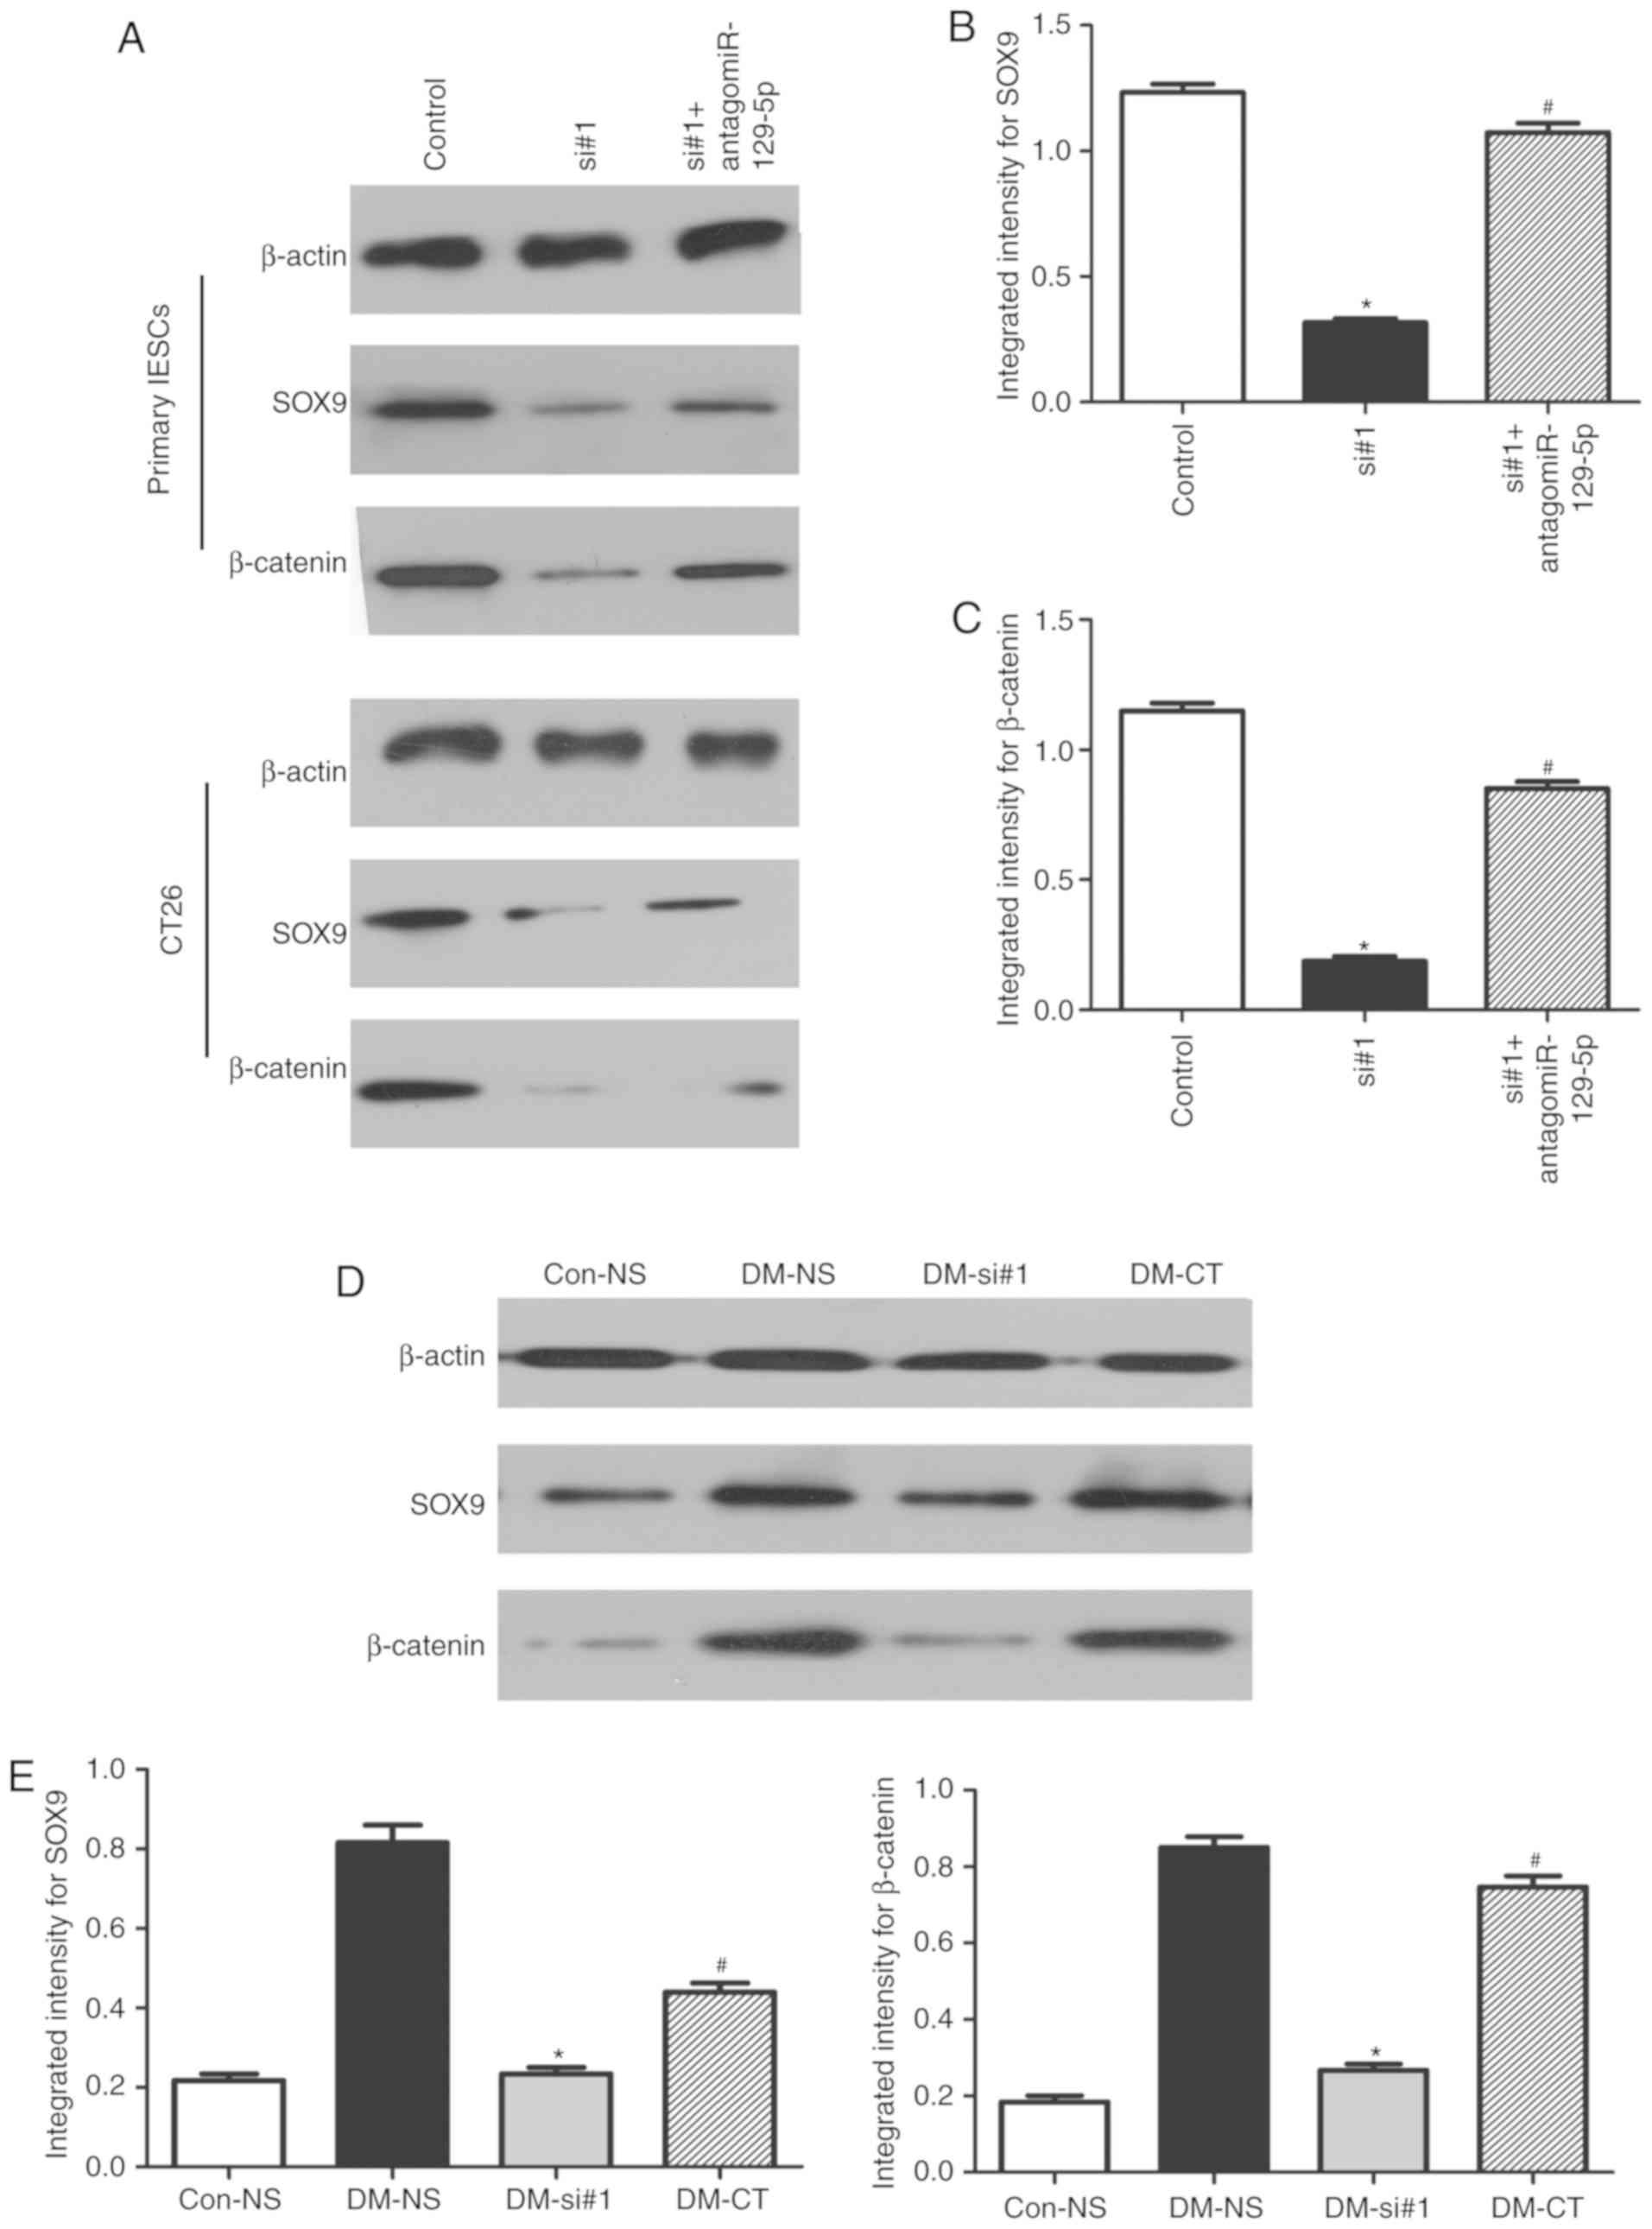 Downregulation Of Lncrna Malat1 Suppresses Abnormal Proliferation